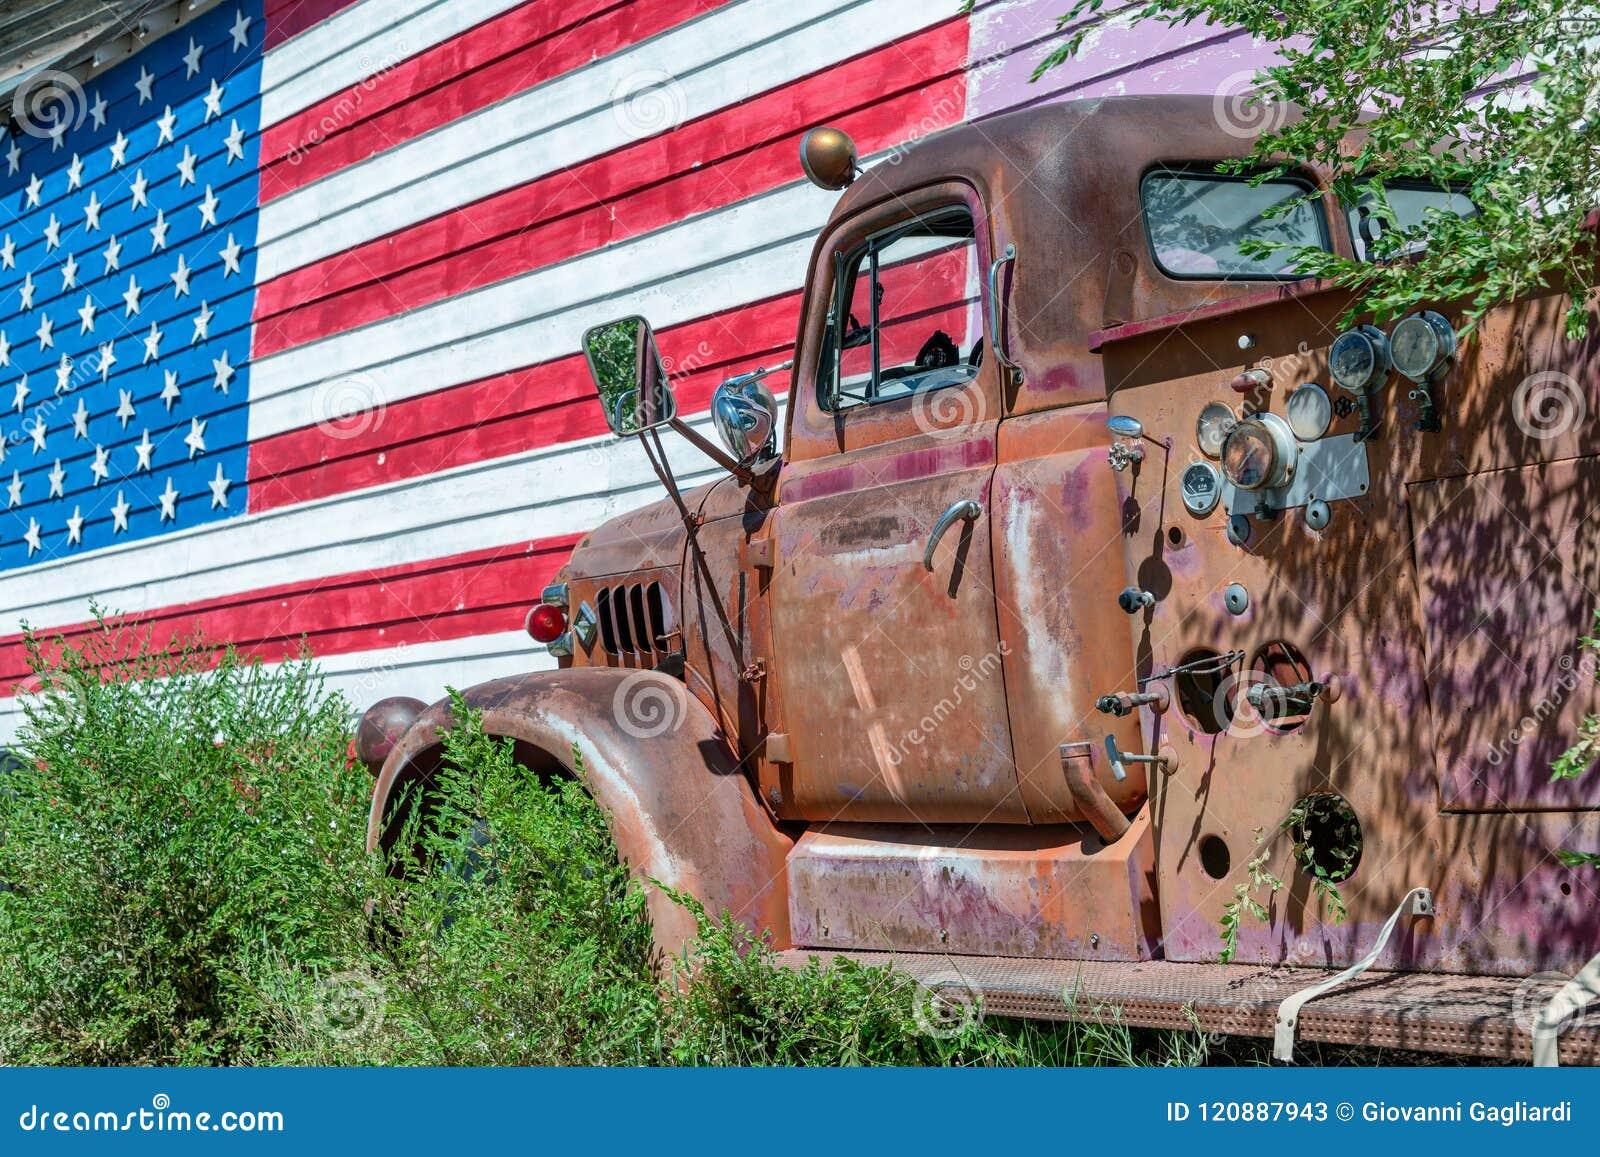 Stara ciężarówka i flaga amerykańska, symbol USA trasa 66